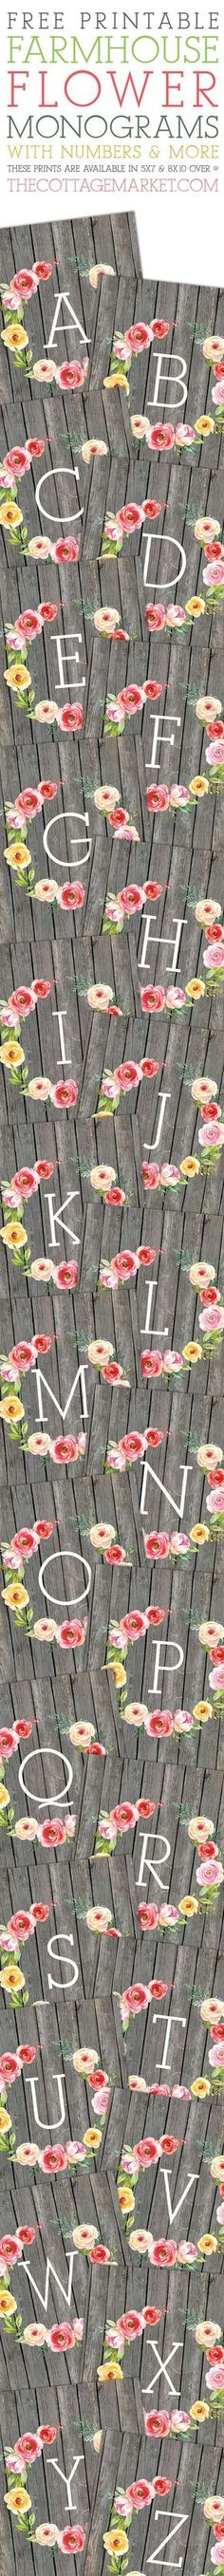 Free Printable Farmhouse Flower Monograms and More!